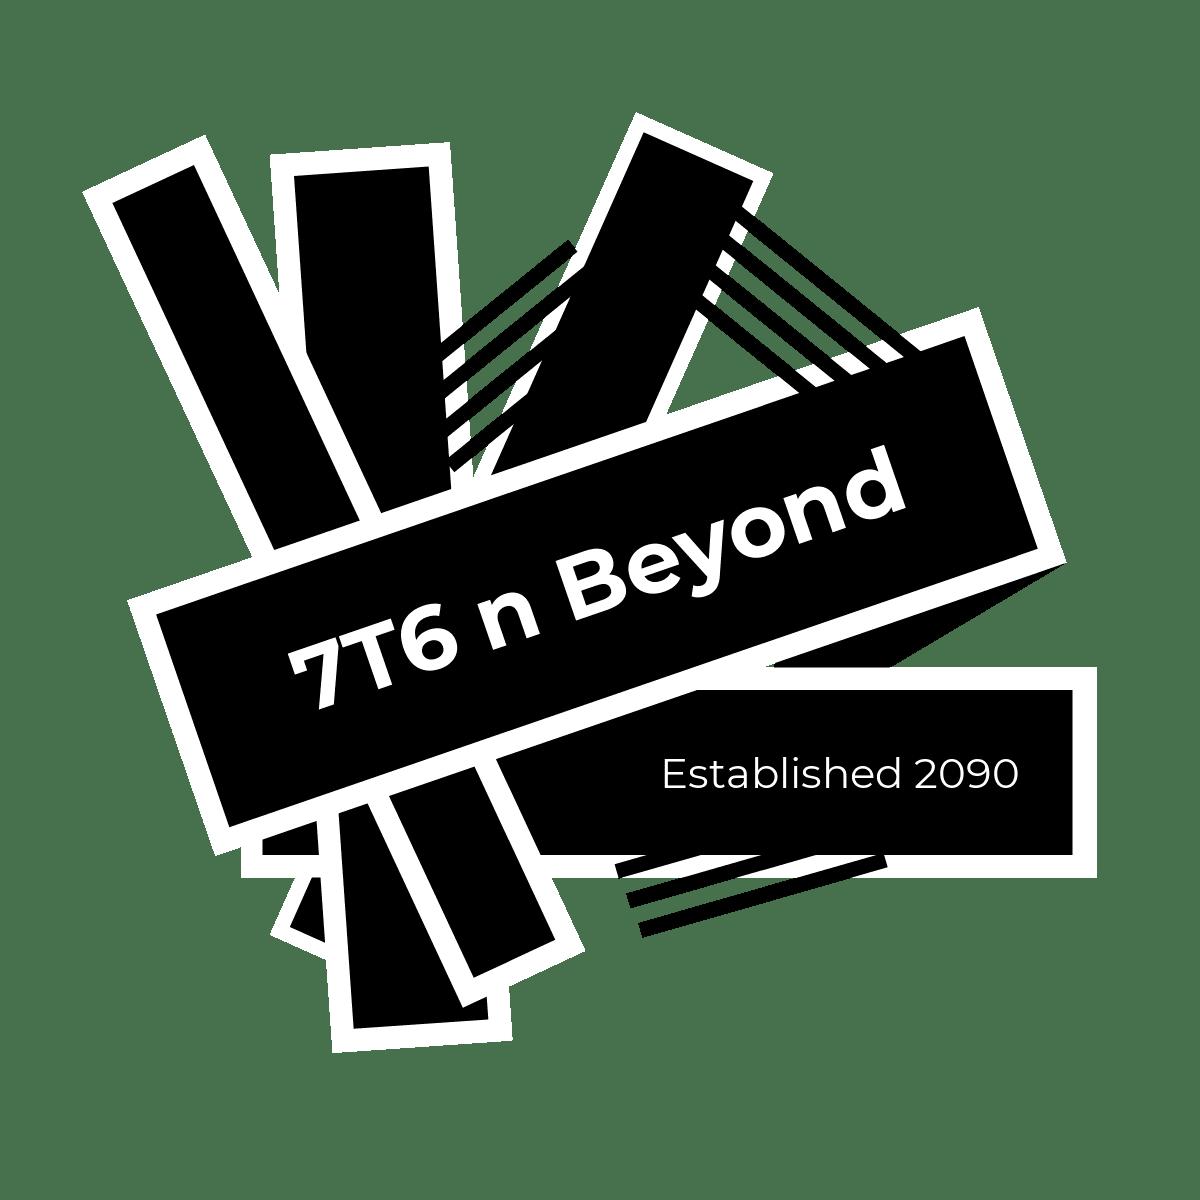 7t6nbeyond.org